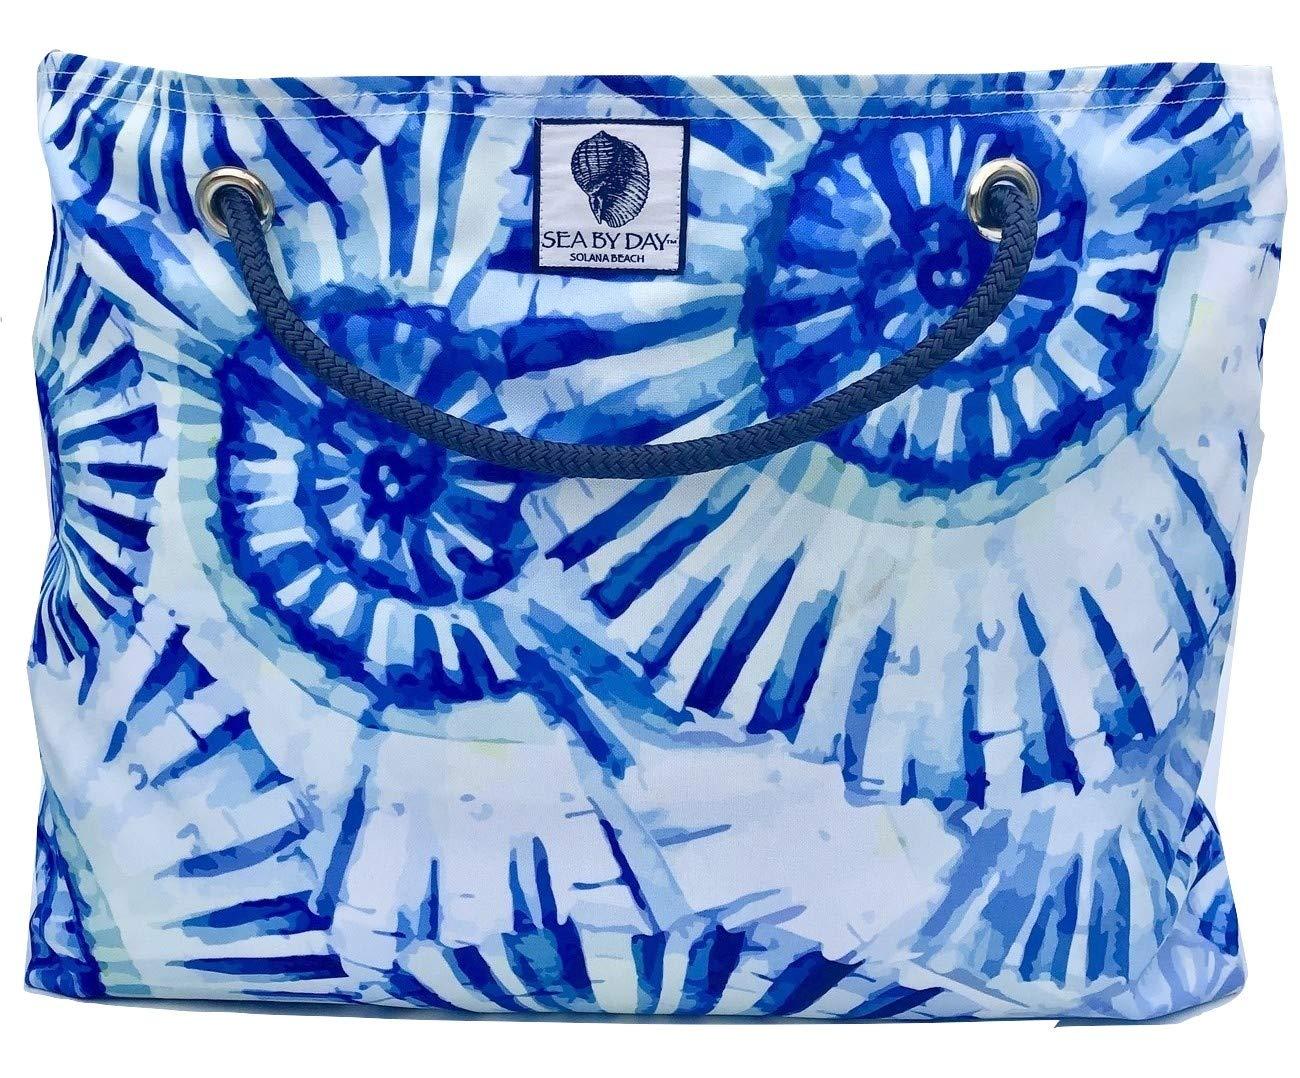 Classic Beach Bag, Pool Bag or Travel Tote- California Style Water Resistant (Shelltastic)